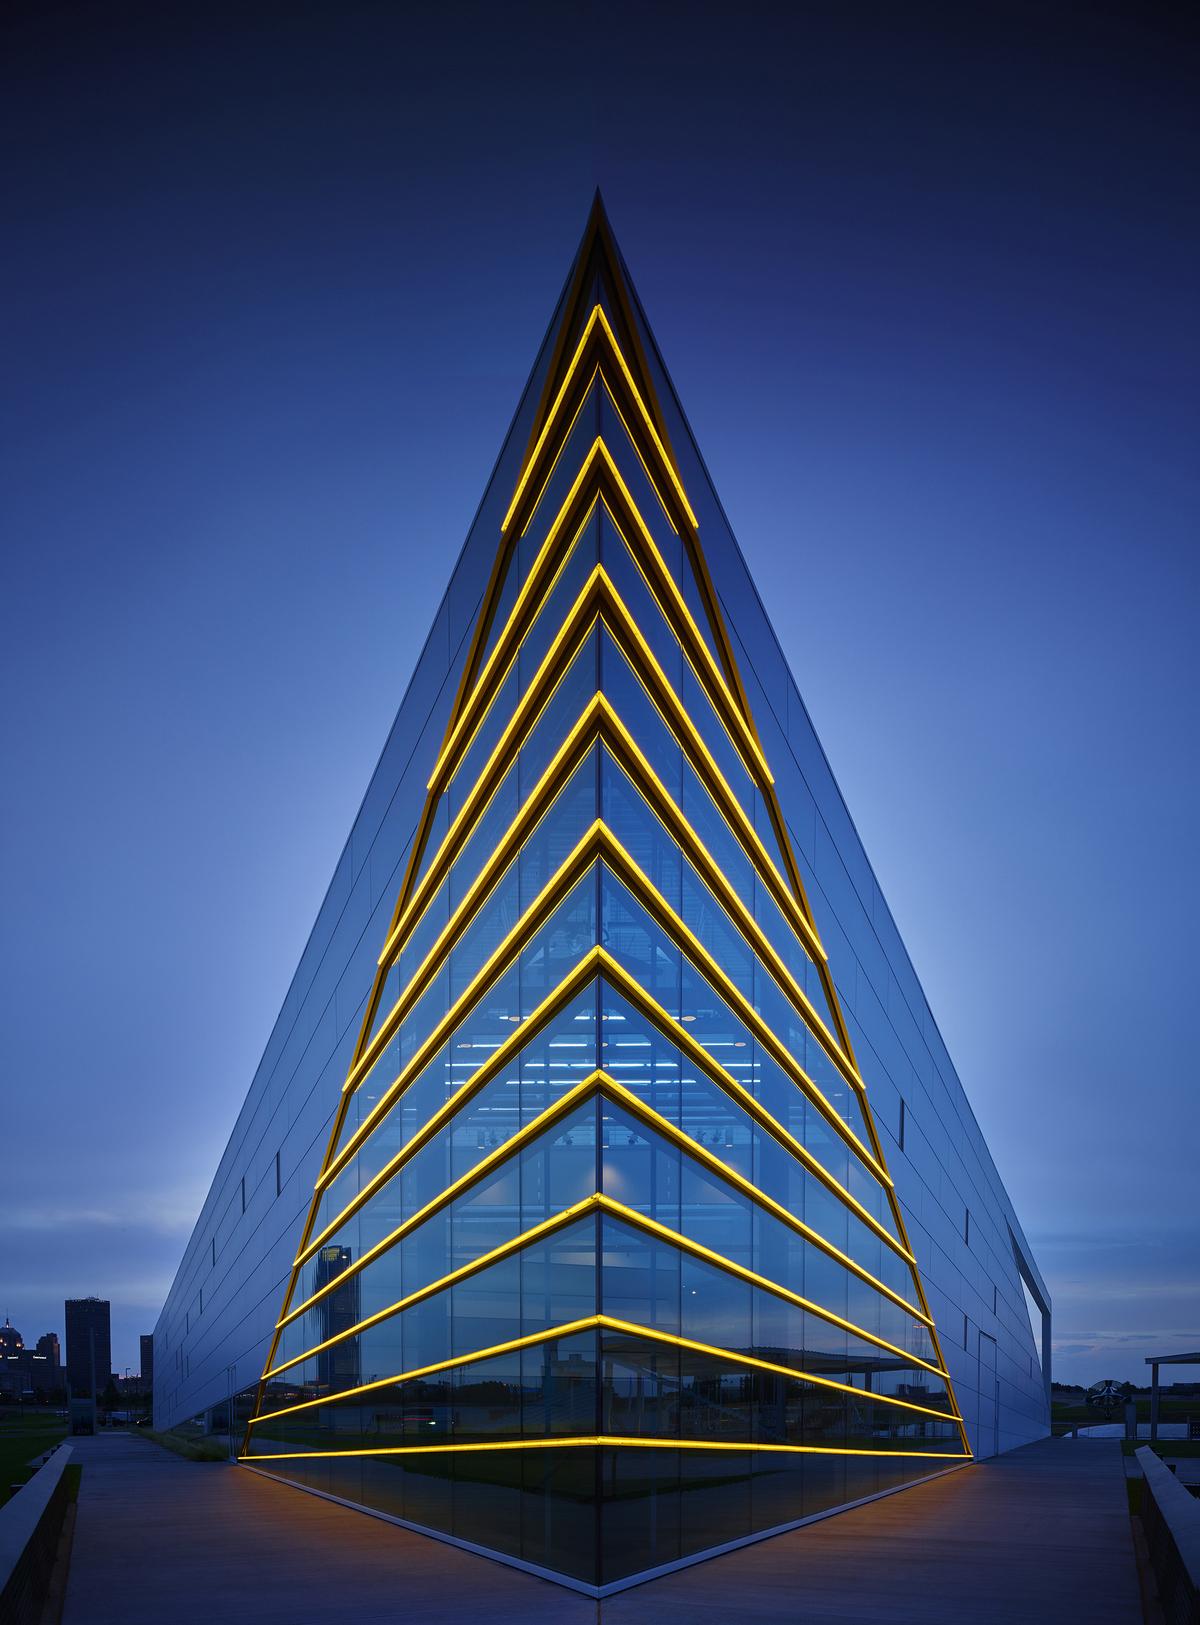 Chk central boathouse elliott associates architects for Linear architecture design